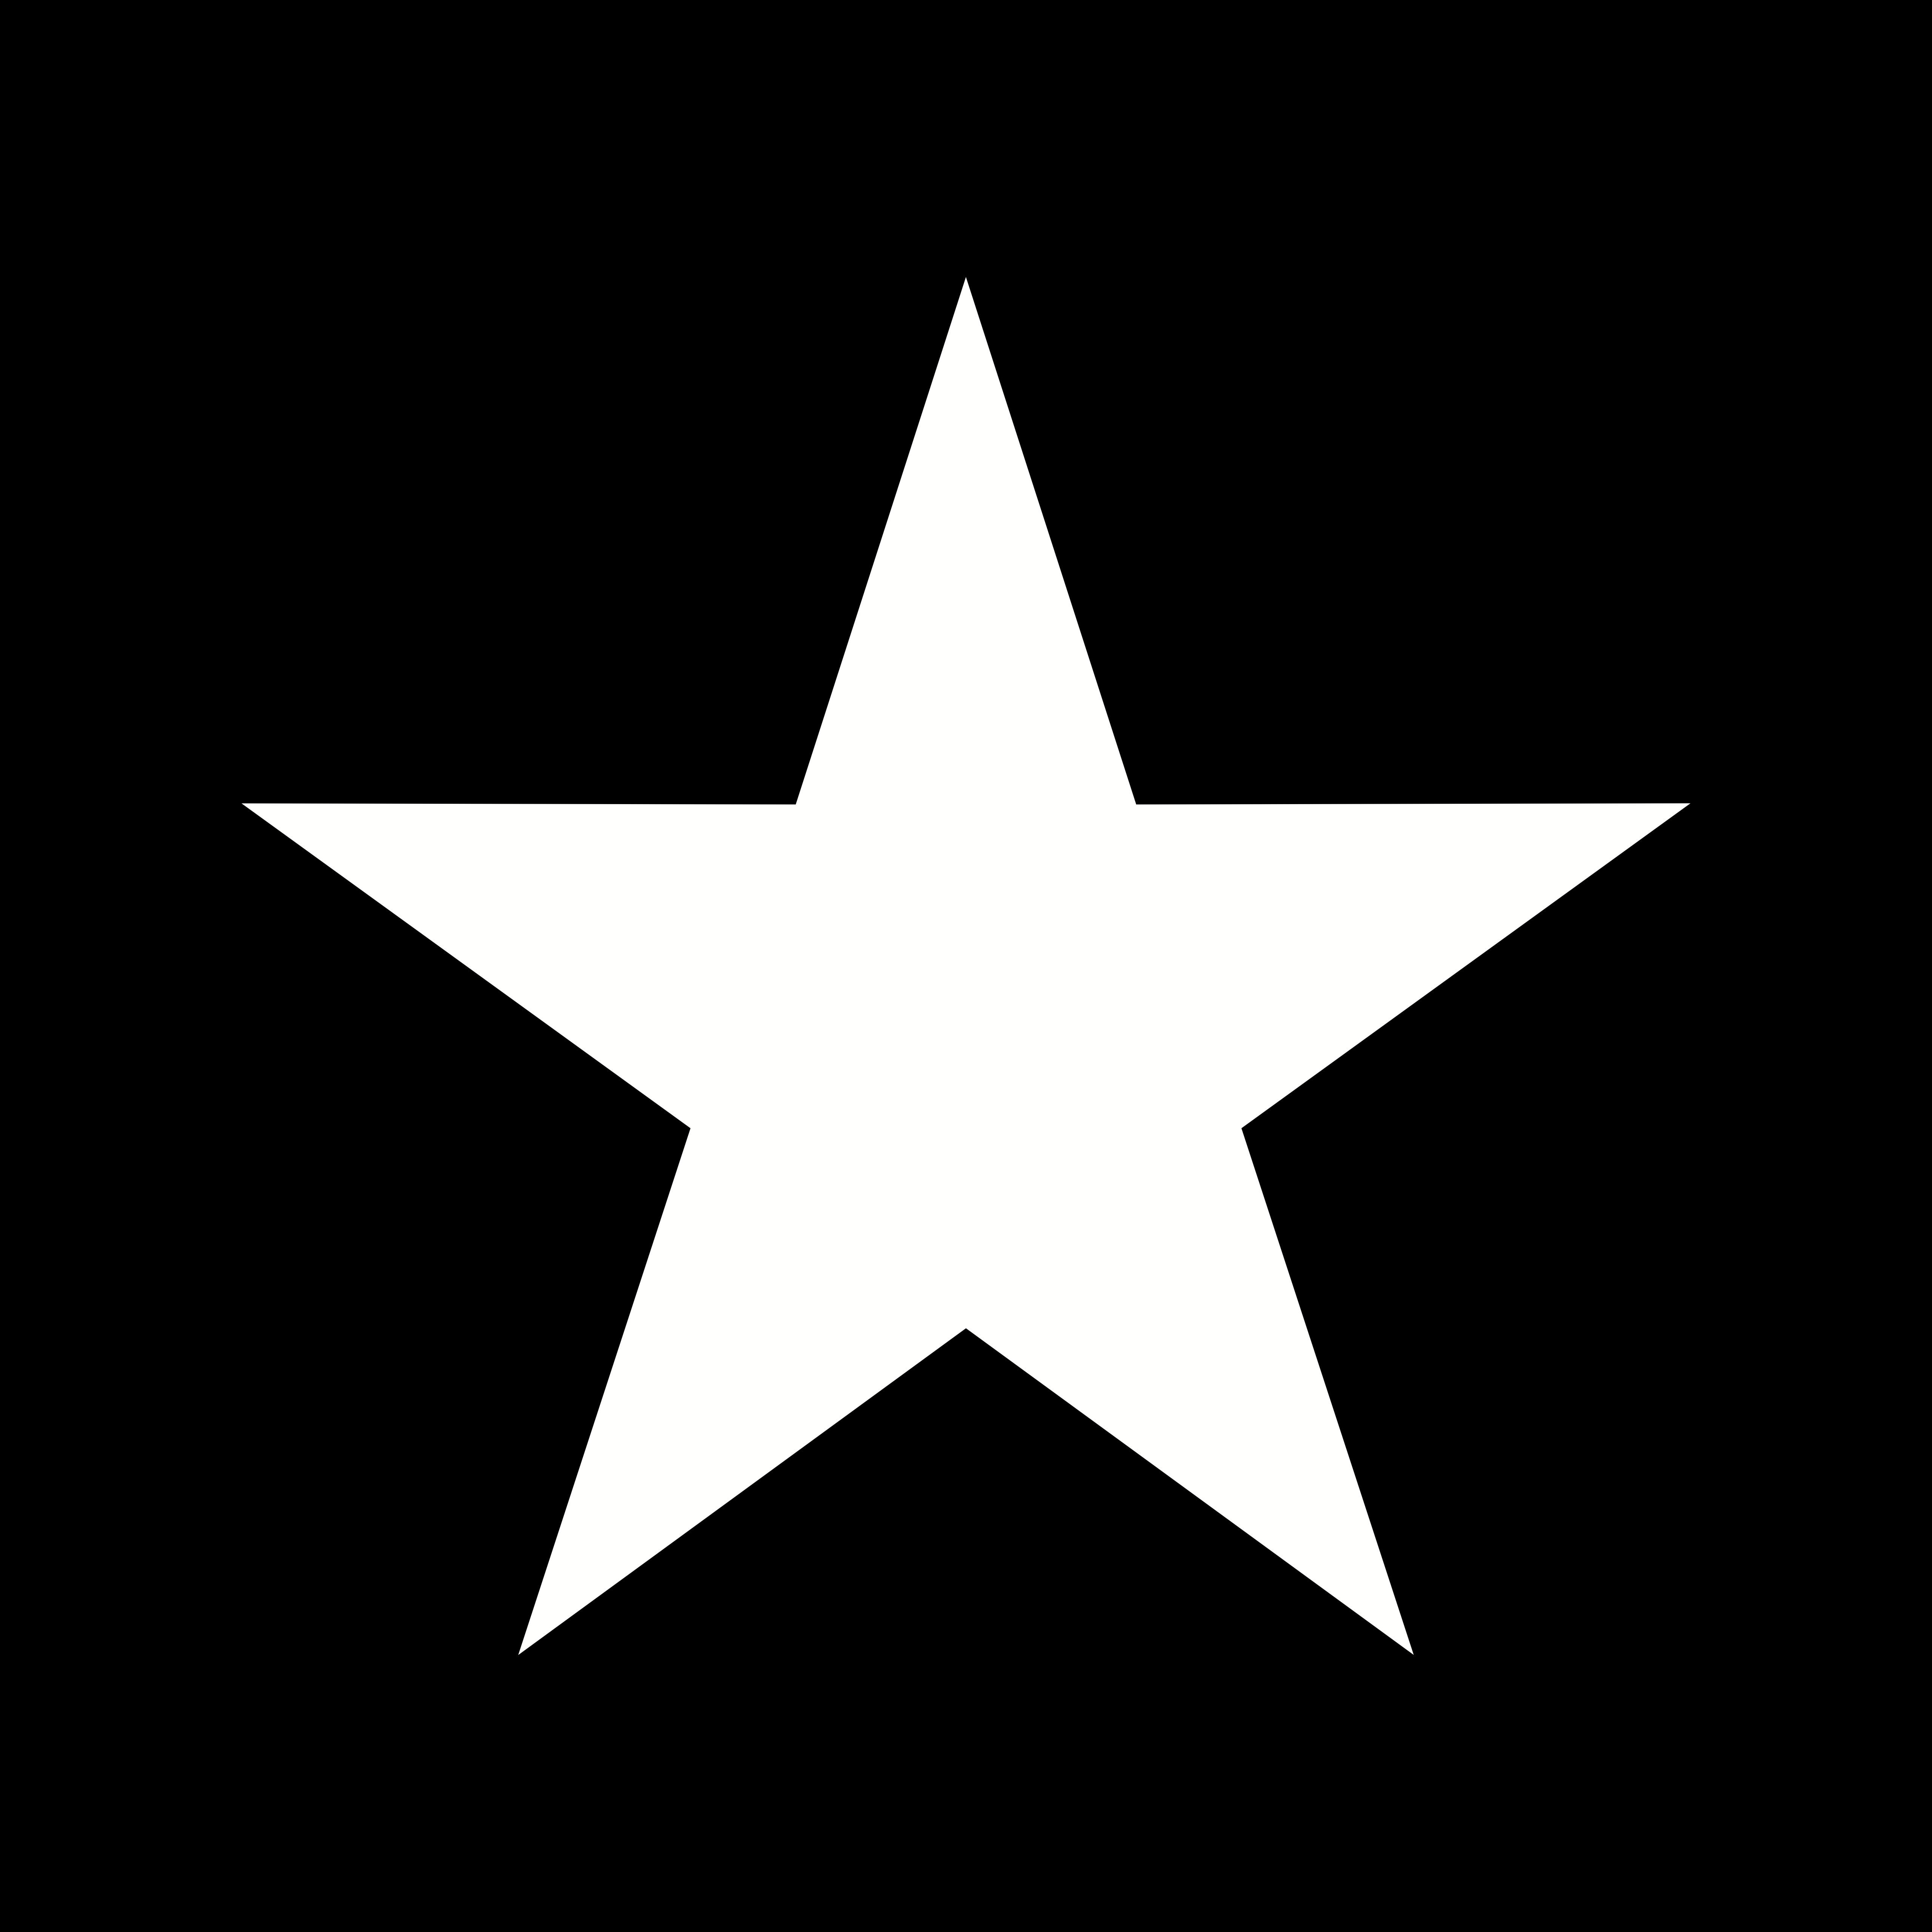 star vector icon 440202 vector art at vecteezy  vecteezy